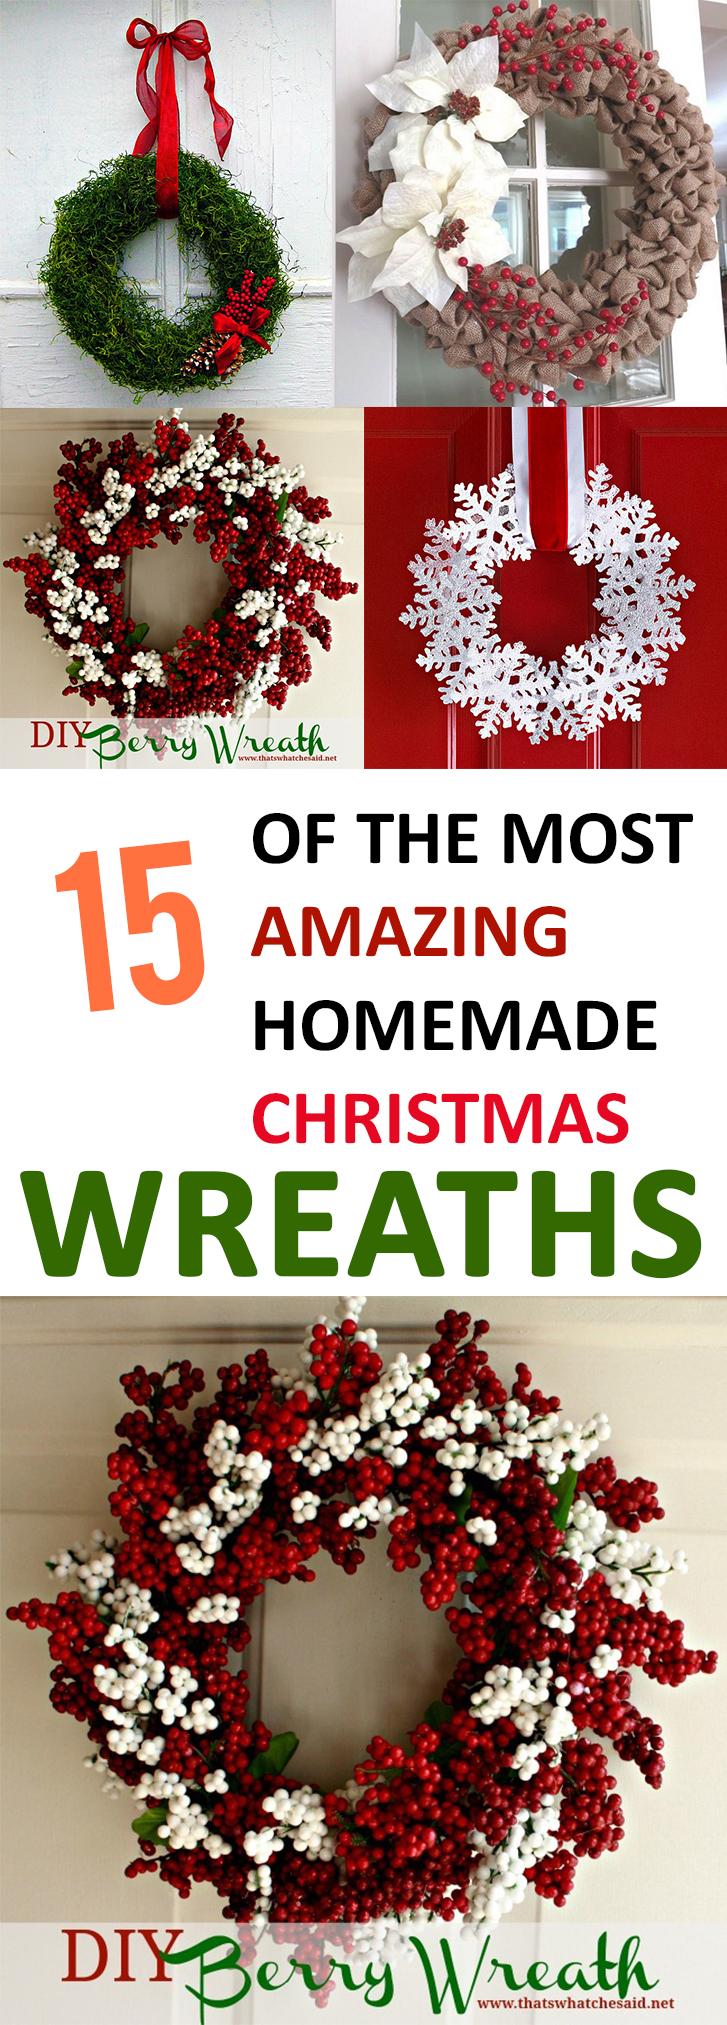 15 Amazing Homemade Christmas Wreath Ideas - Sunlit Spaces ...